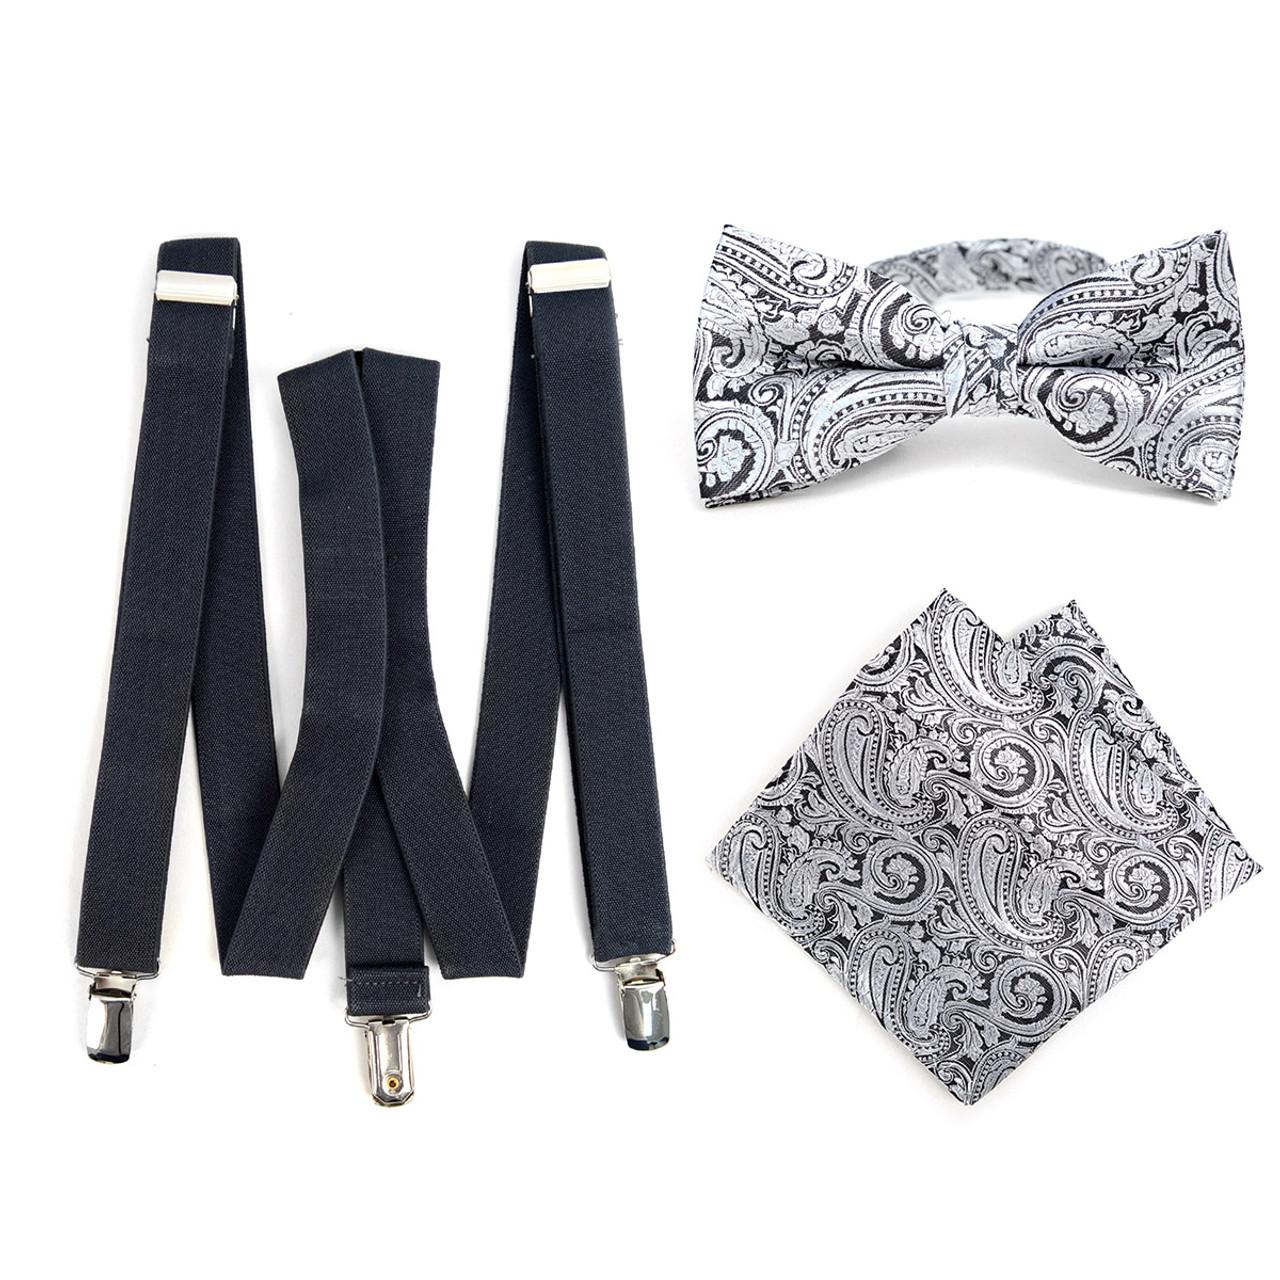 d737e67f99e6 3pc Men's Charcoal Clip-on Suspenders, Paisley Bow Tie & Hanky Sets -  FYBTHSU-CHAR#4